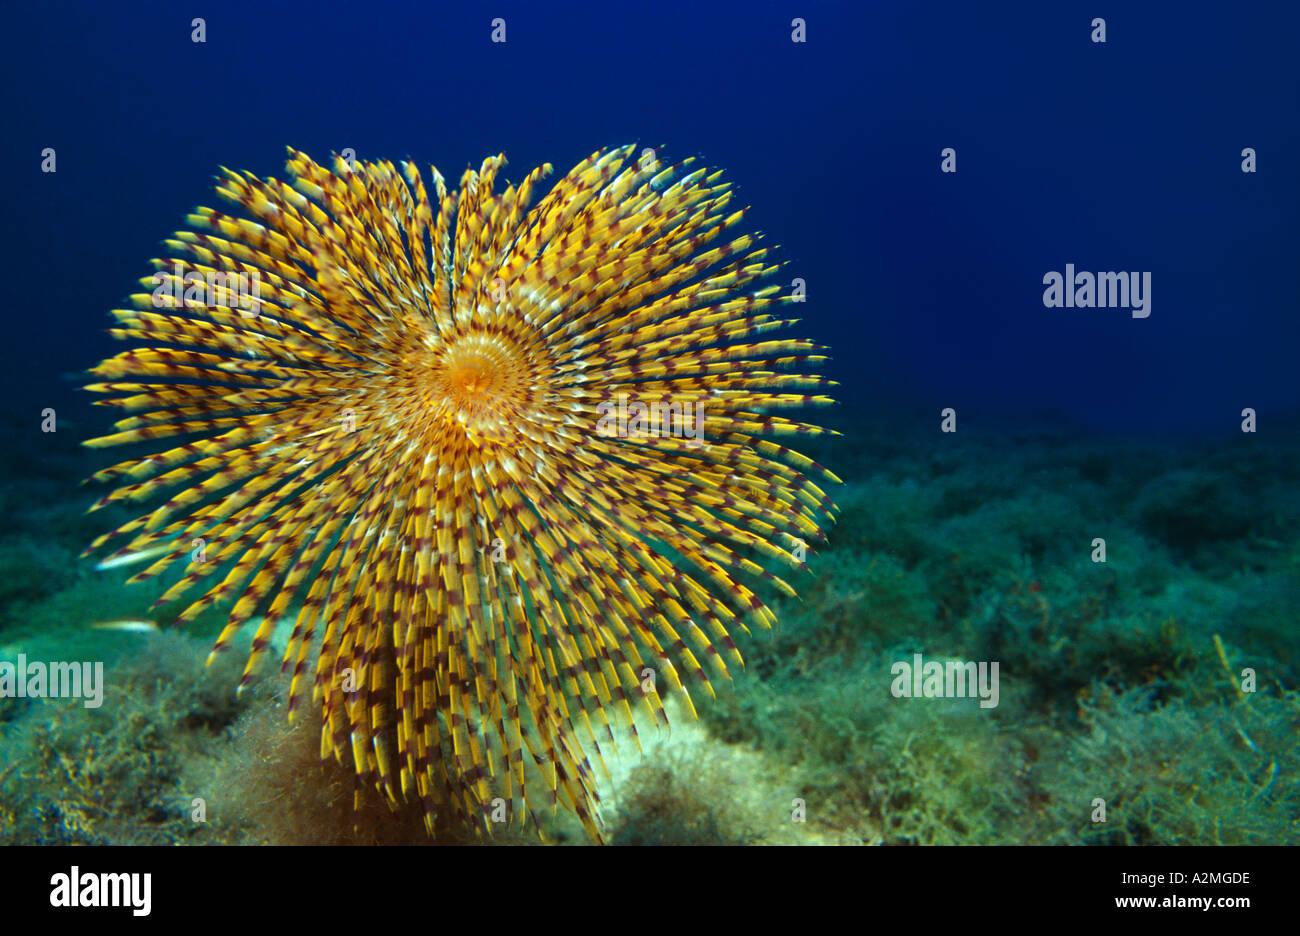 Fan worm on the seafloor, Spirographis spallanzani Stock Photo